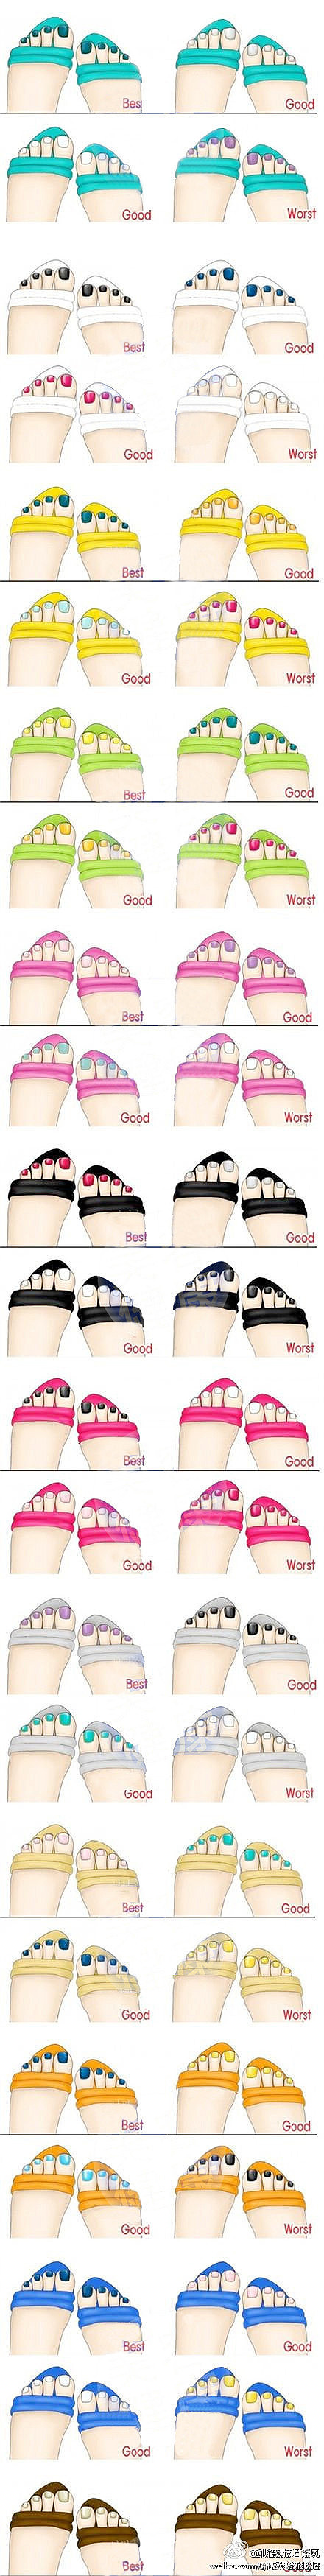 matching color toe nails